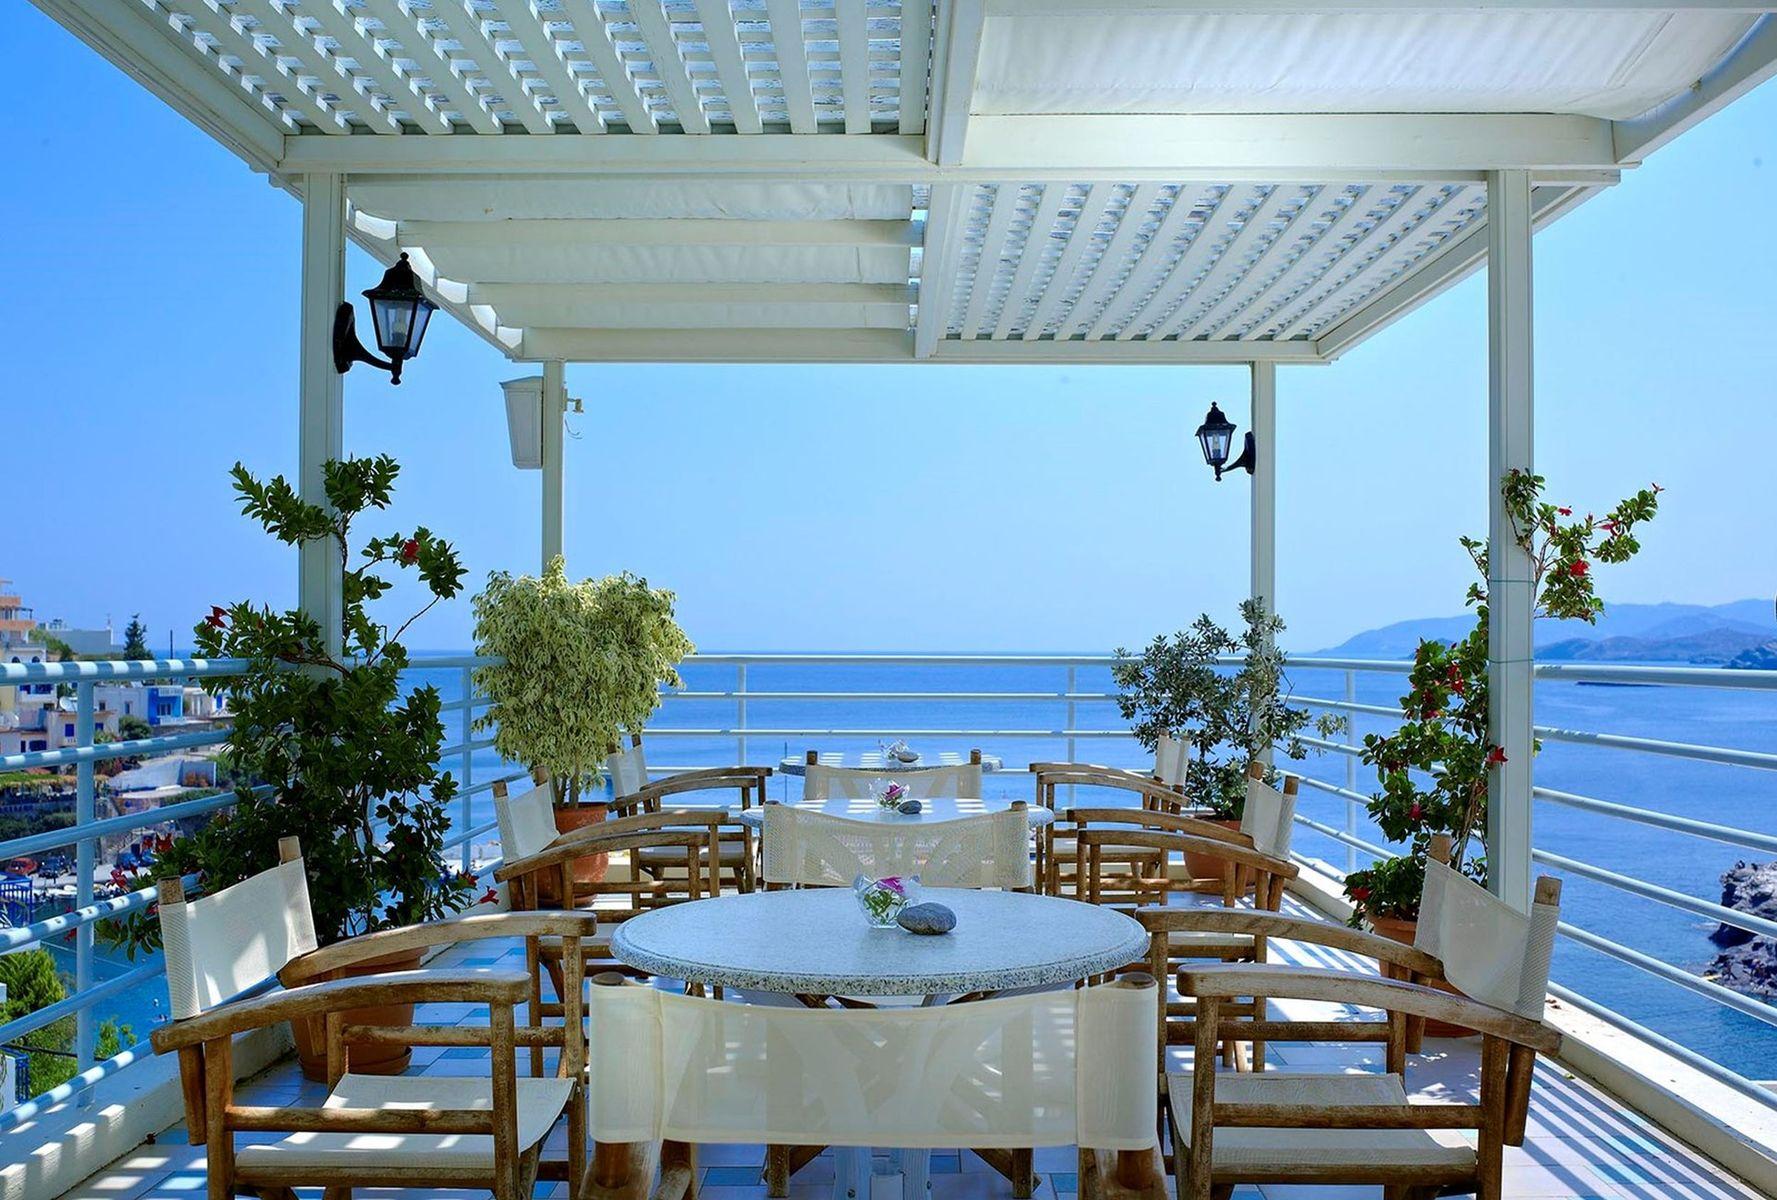 Bali Beach And Village In Bali Crete Crete Loveholidays